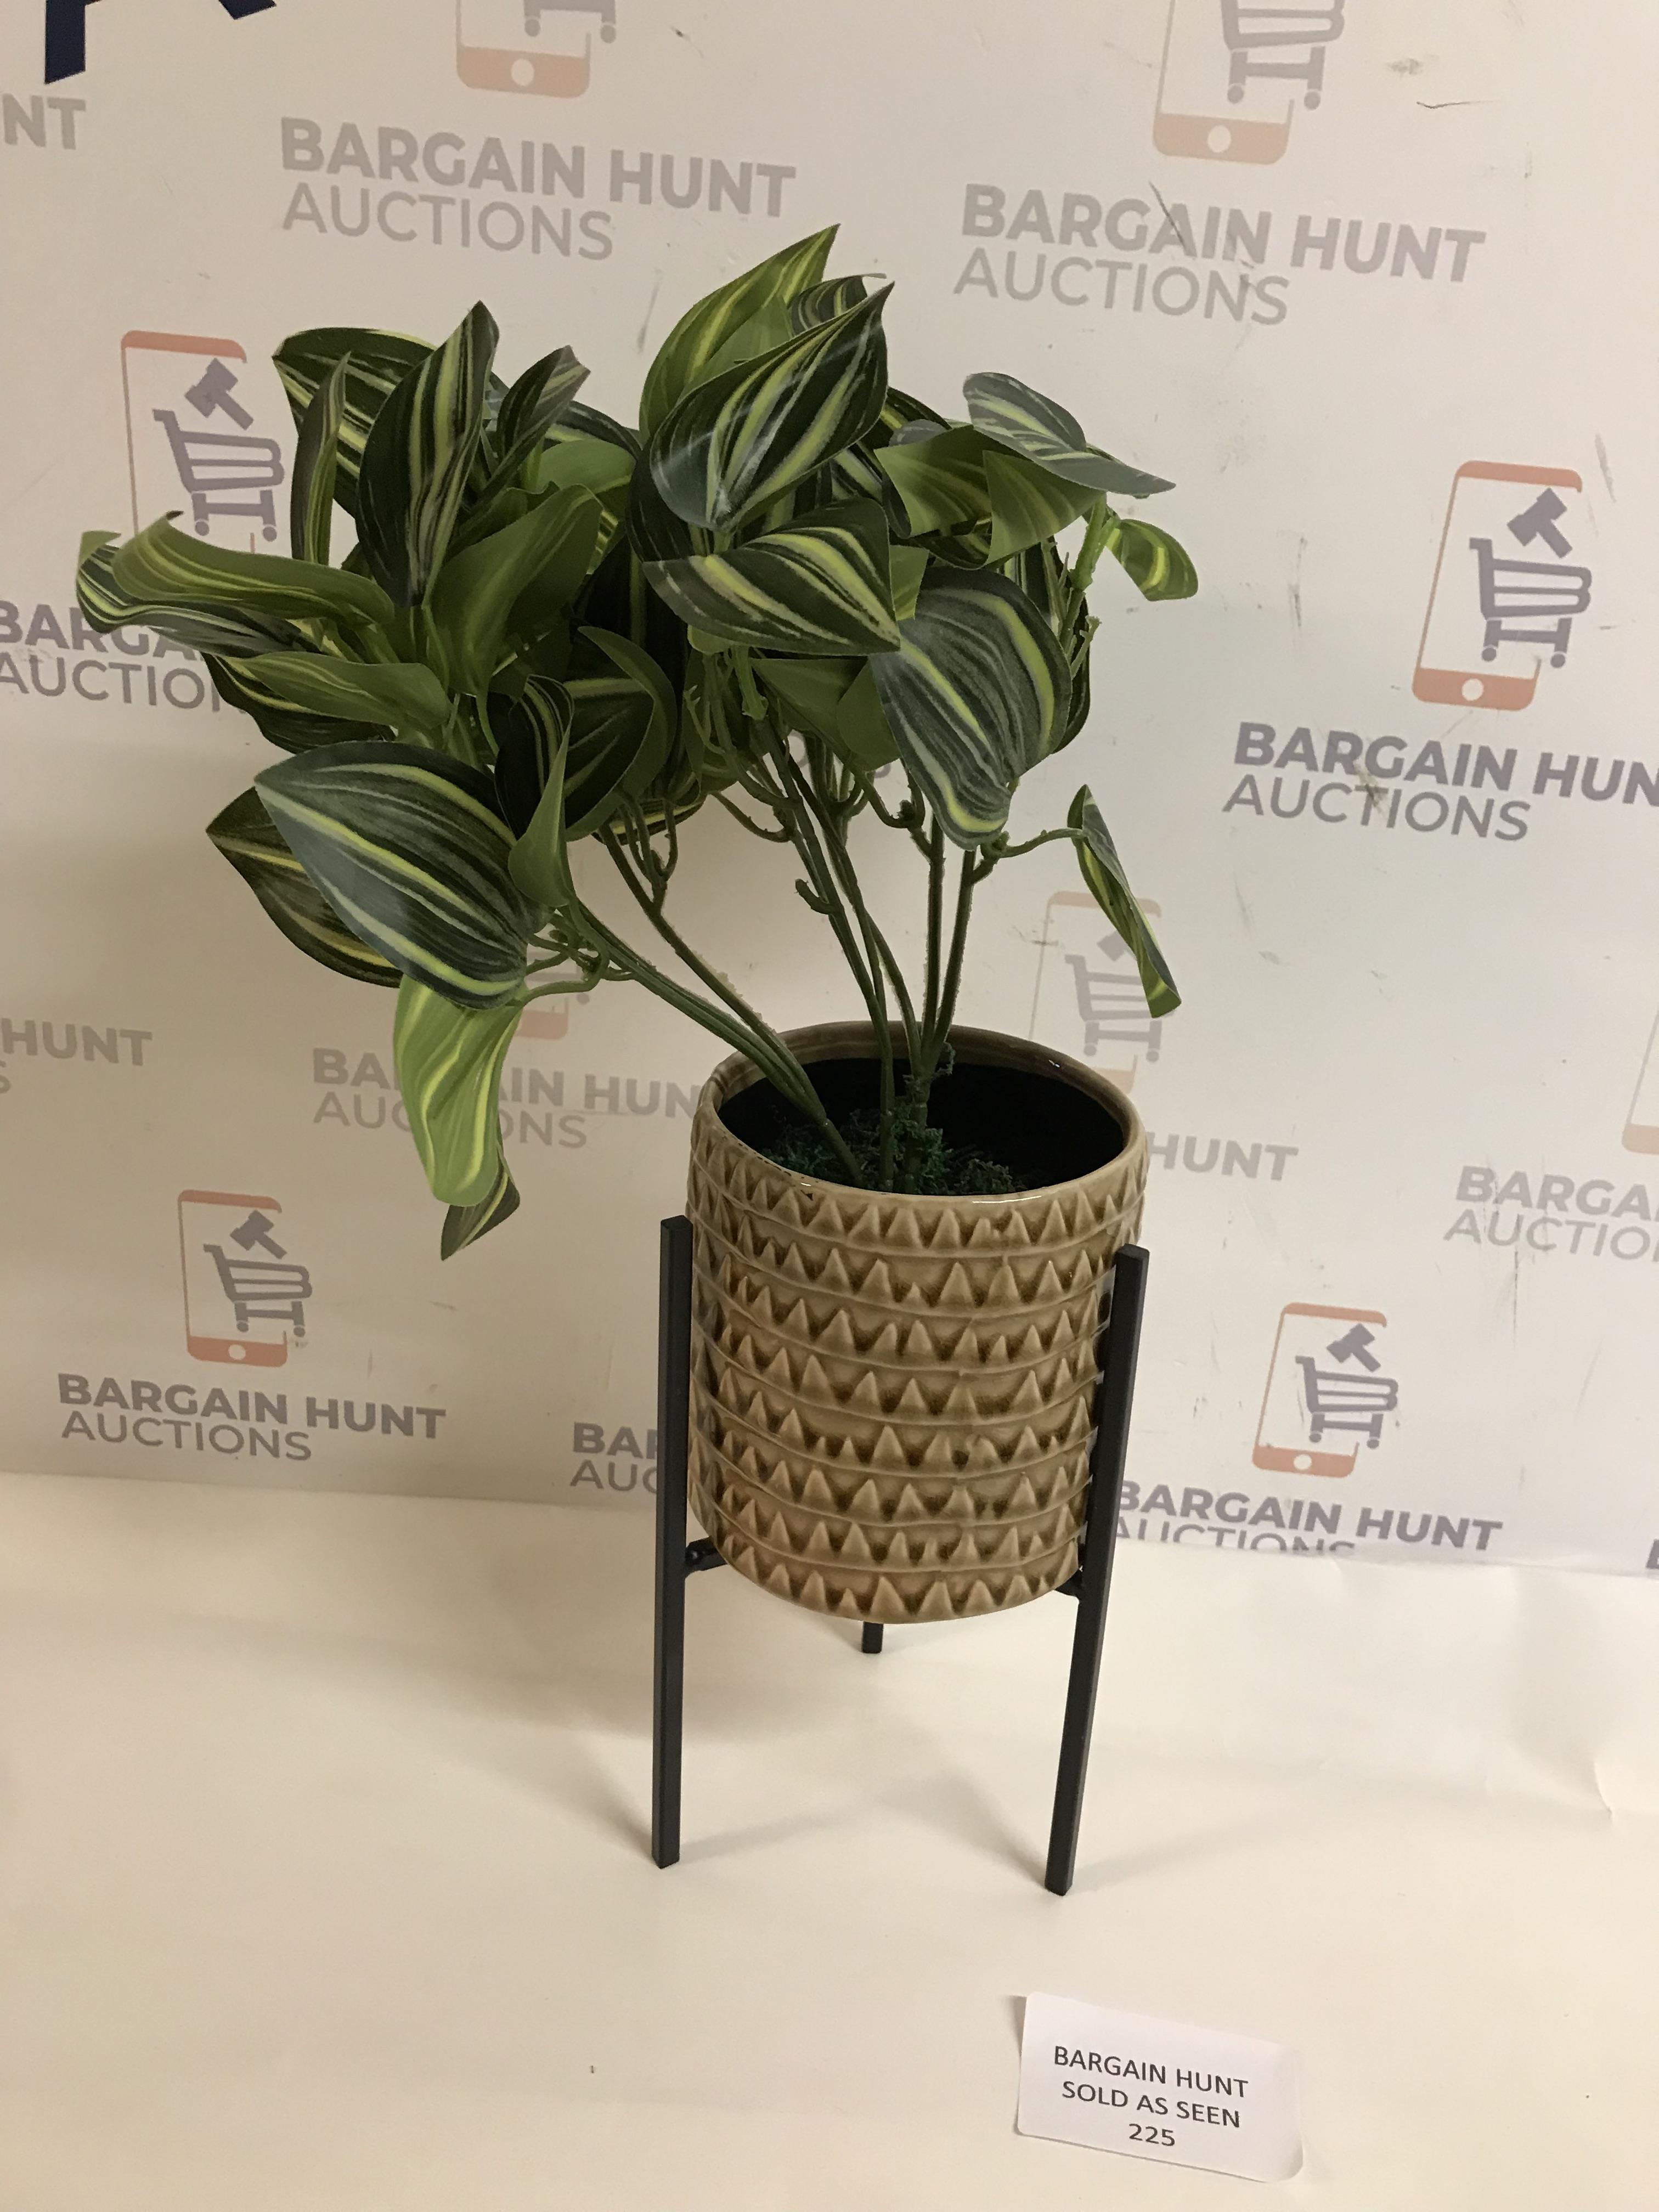 Lot 225 - Plant on Legs